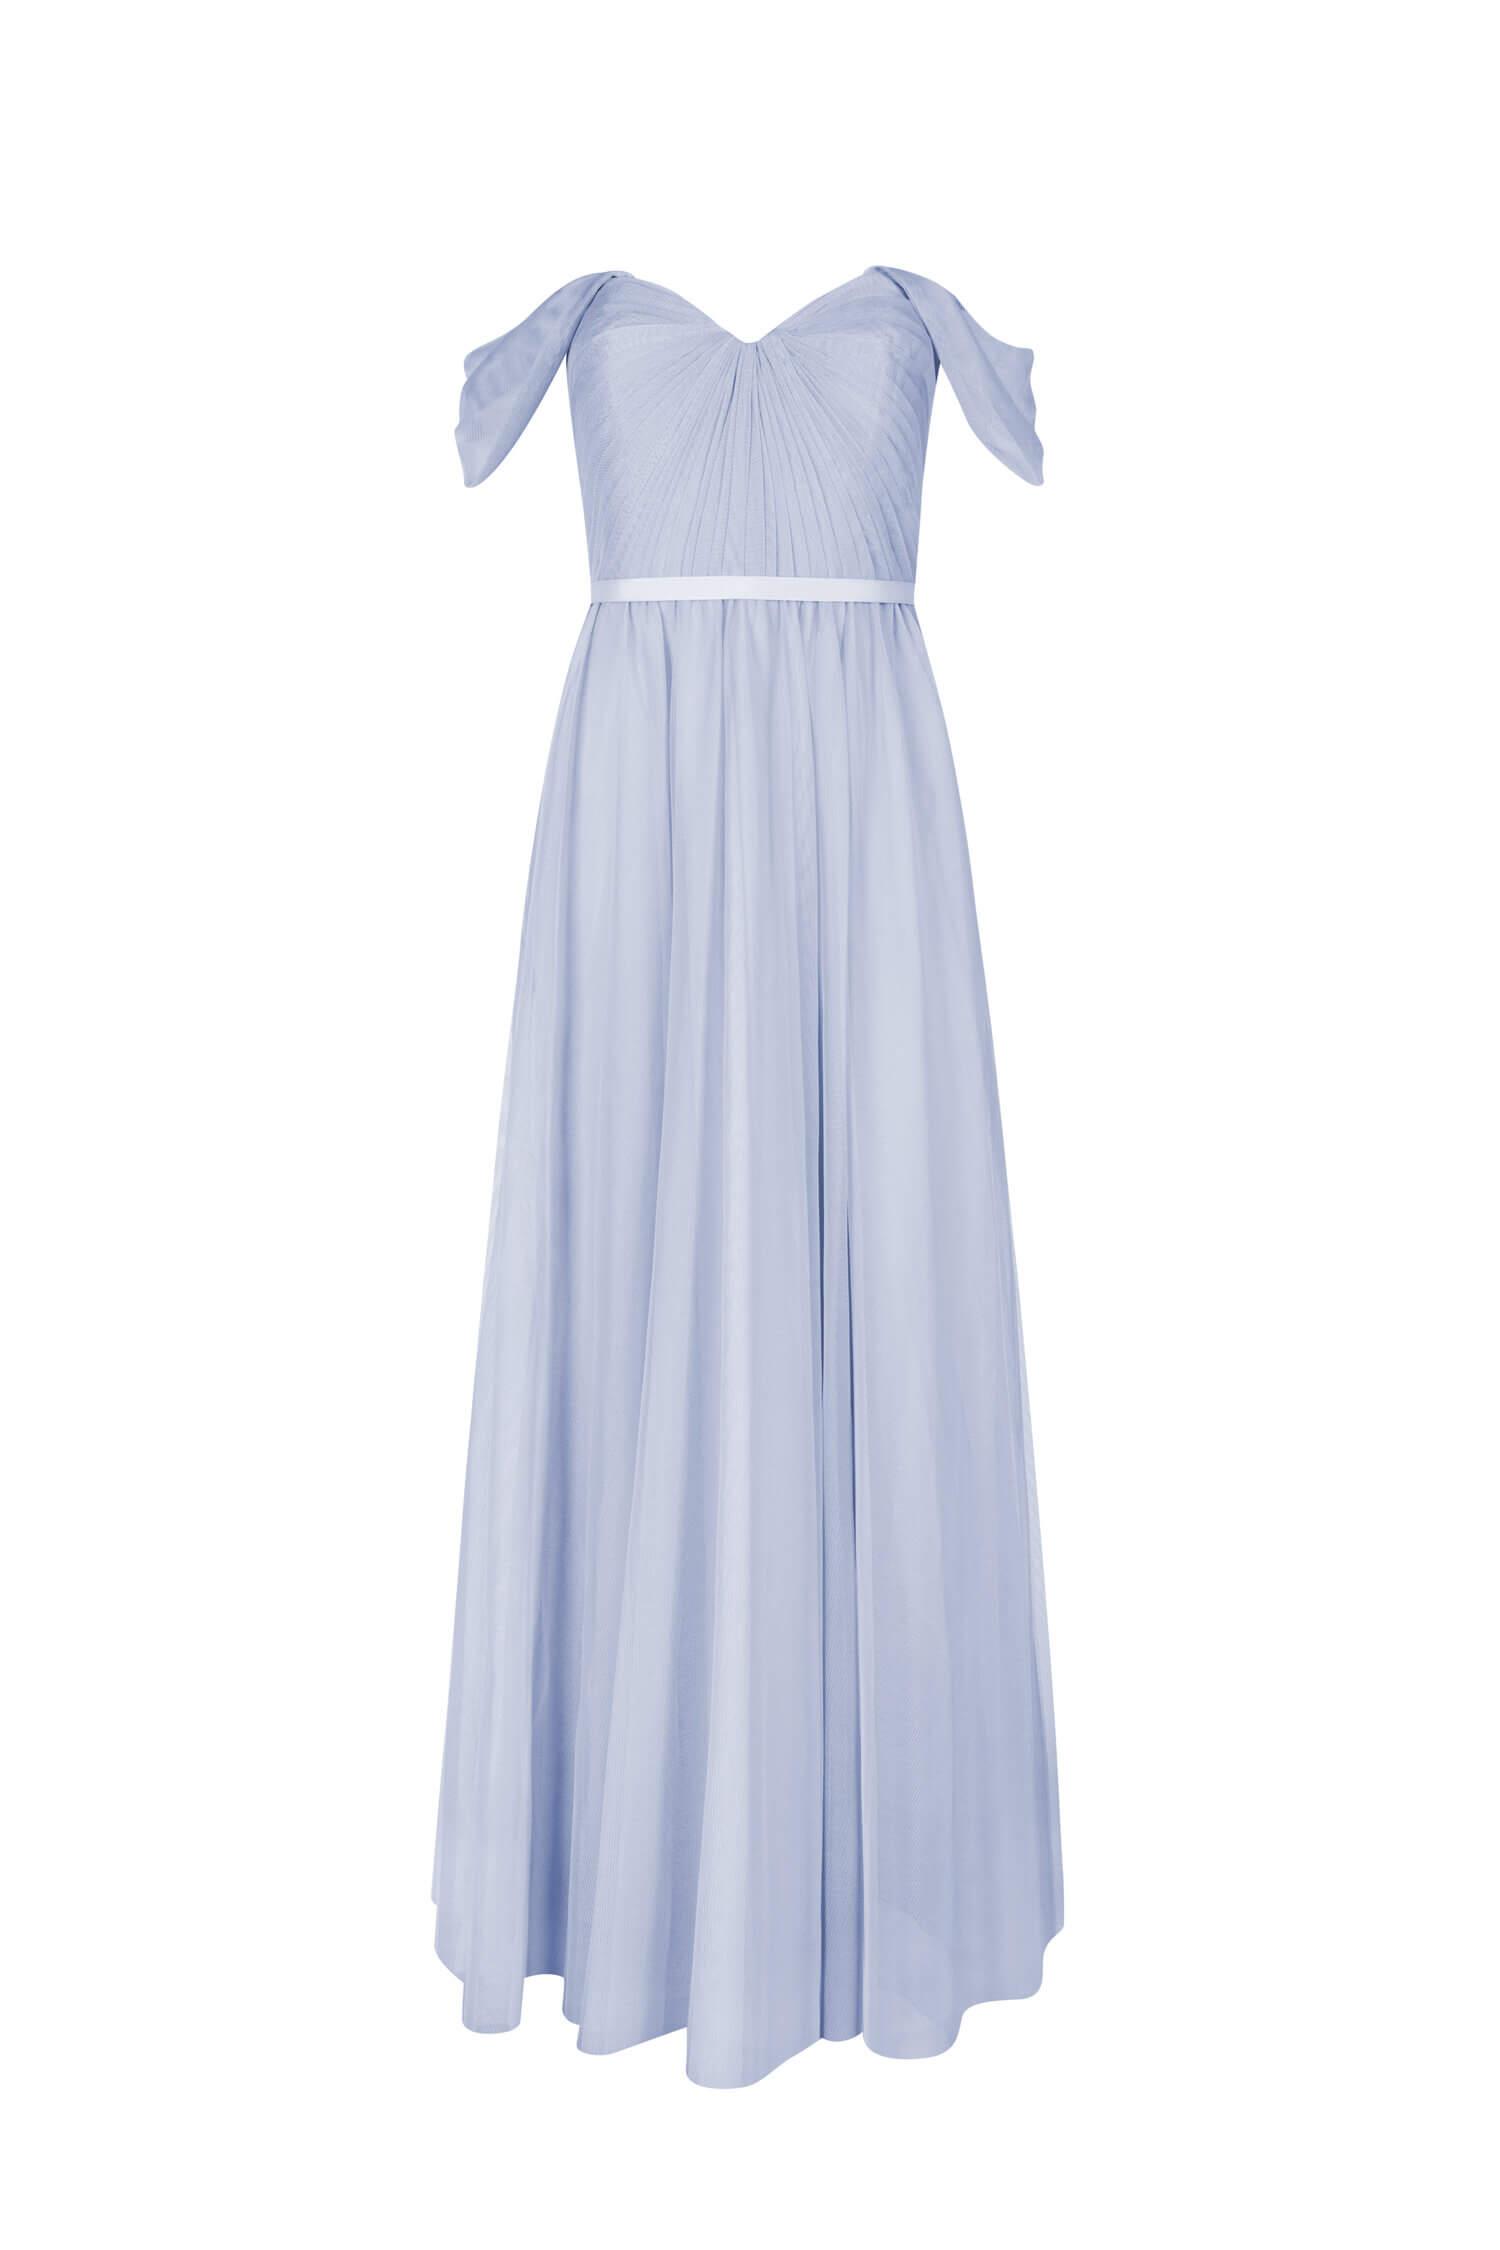 TH&H Bardot Bridesmaid Dress TH&H Bridesmaid Dress Powder Blue